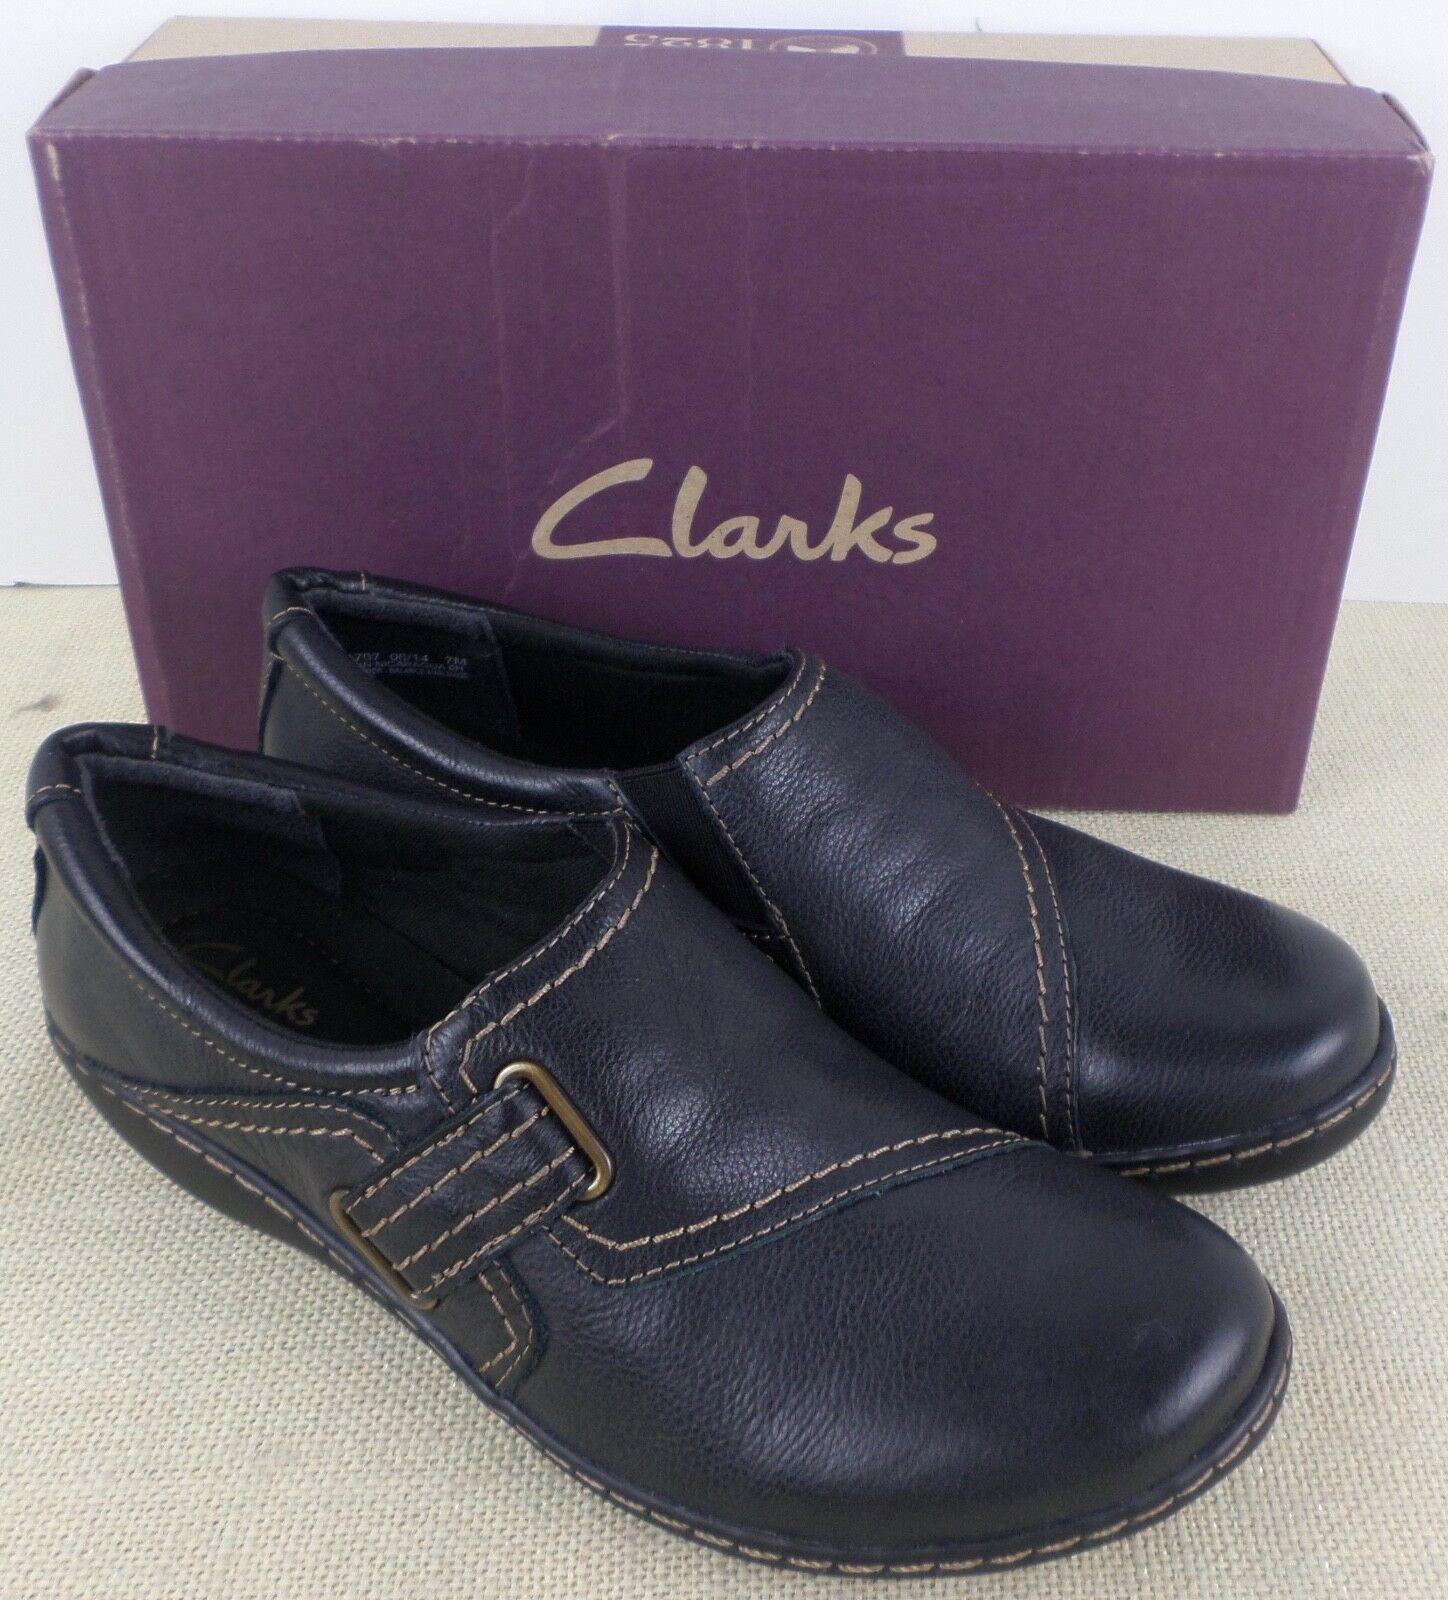 CLARKS 01707 ASHLAND blueSH WOMEN'S BLACK LEATHER SLIP ON SHOES NEW IN BOX